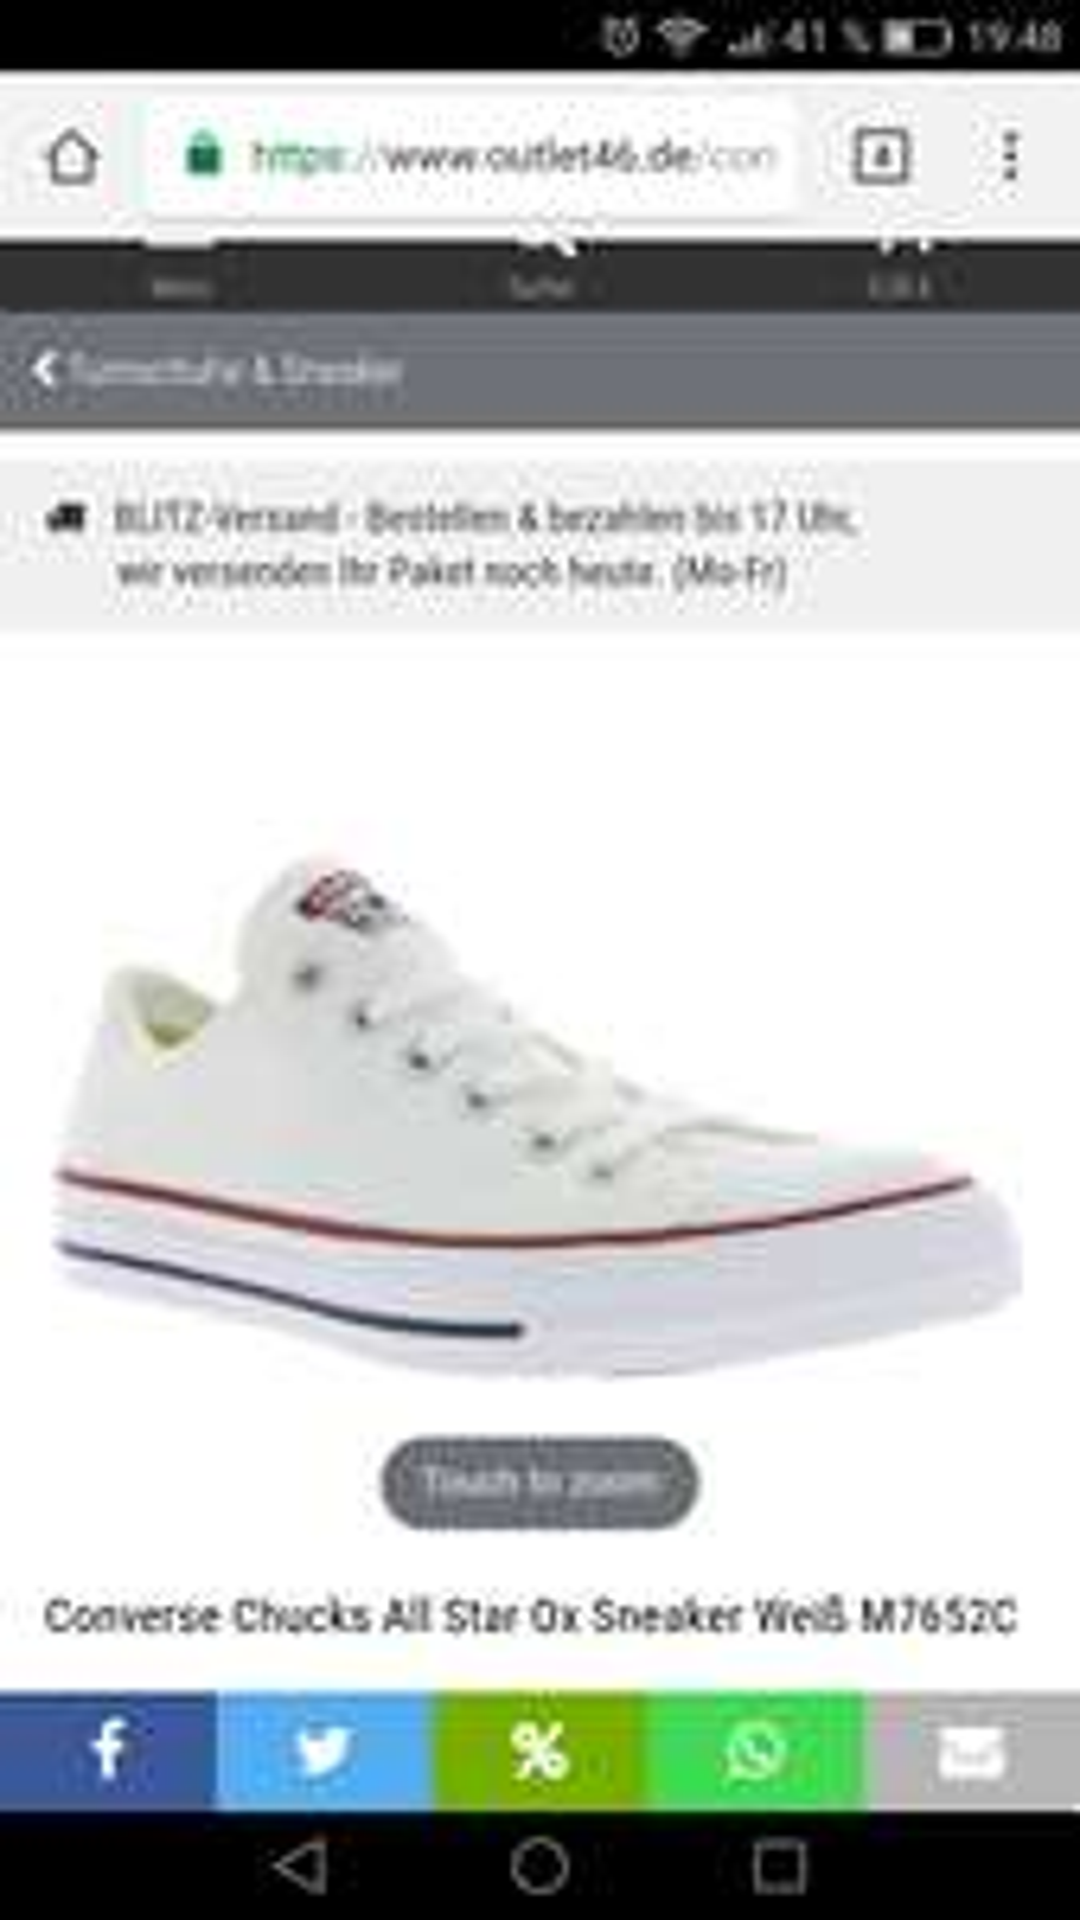 Converse Sneakers für die ganze Familie je 34,99 (Outlet 46)**